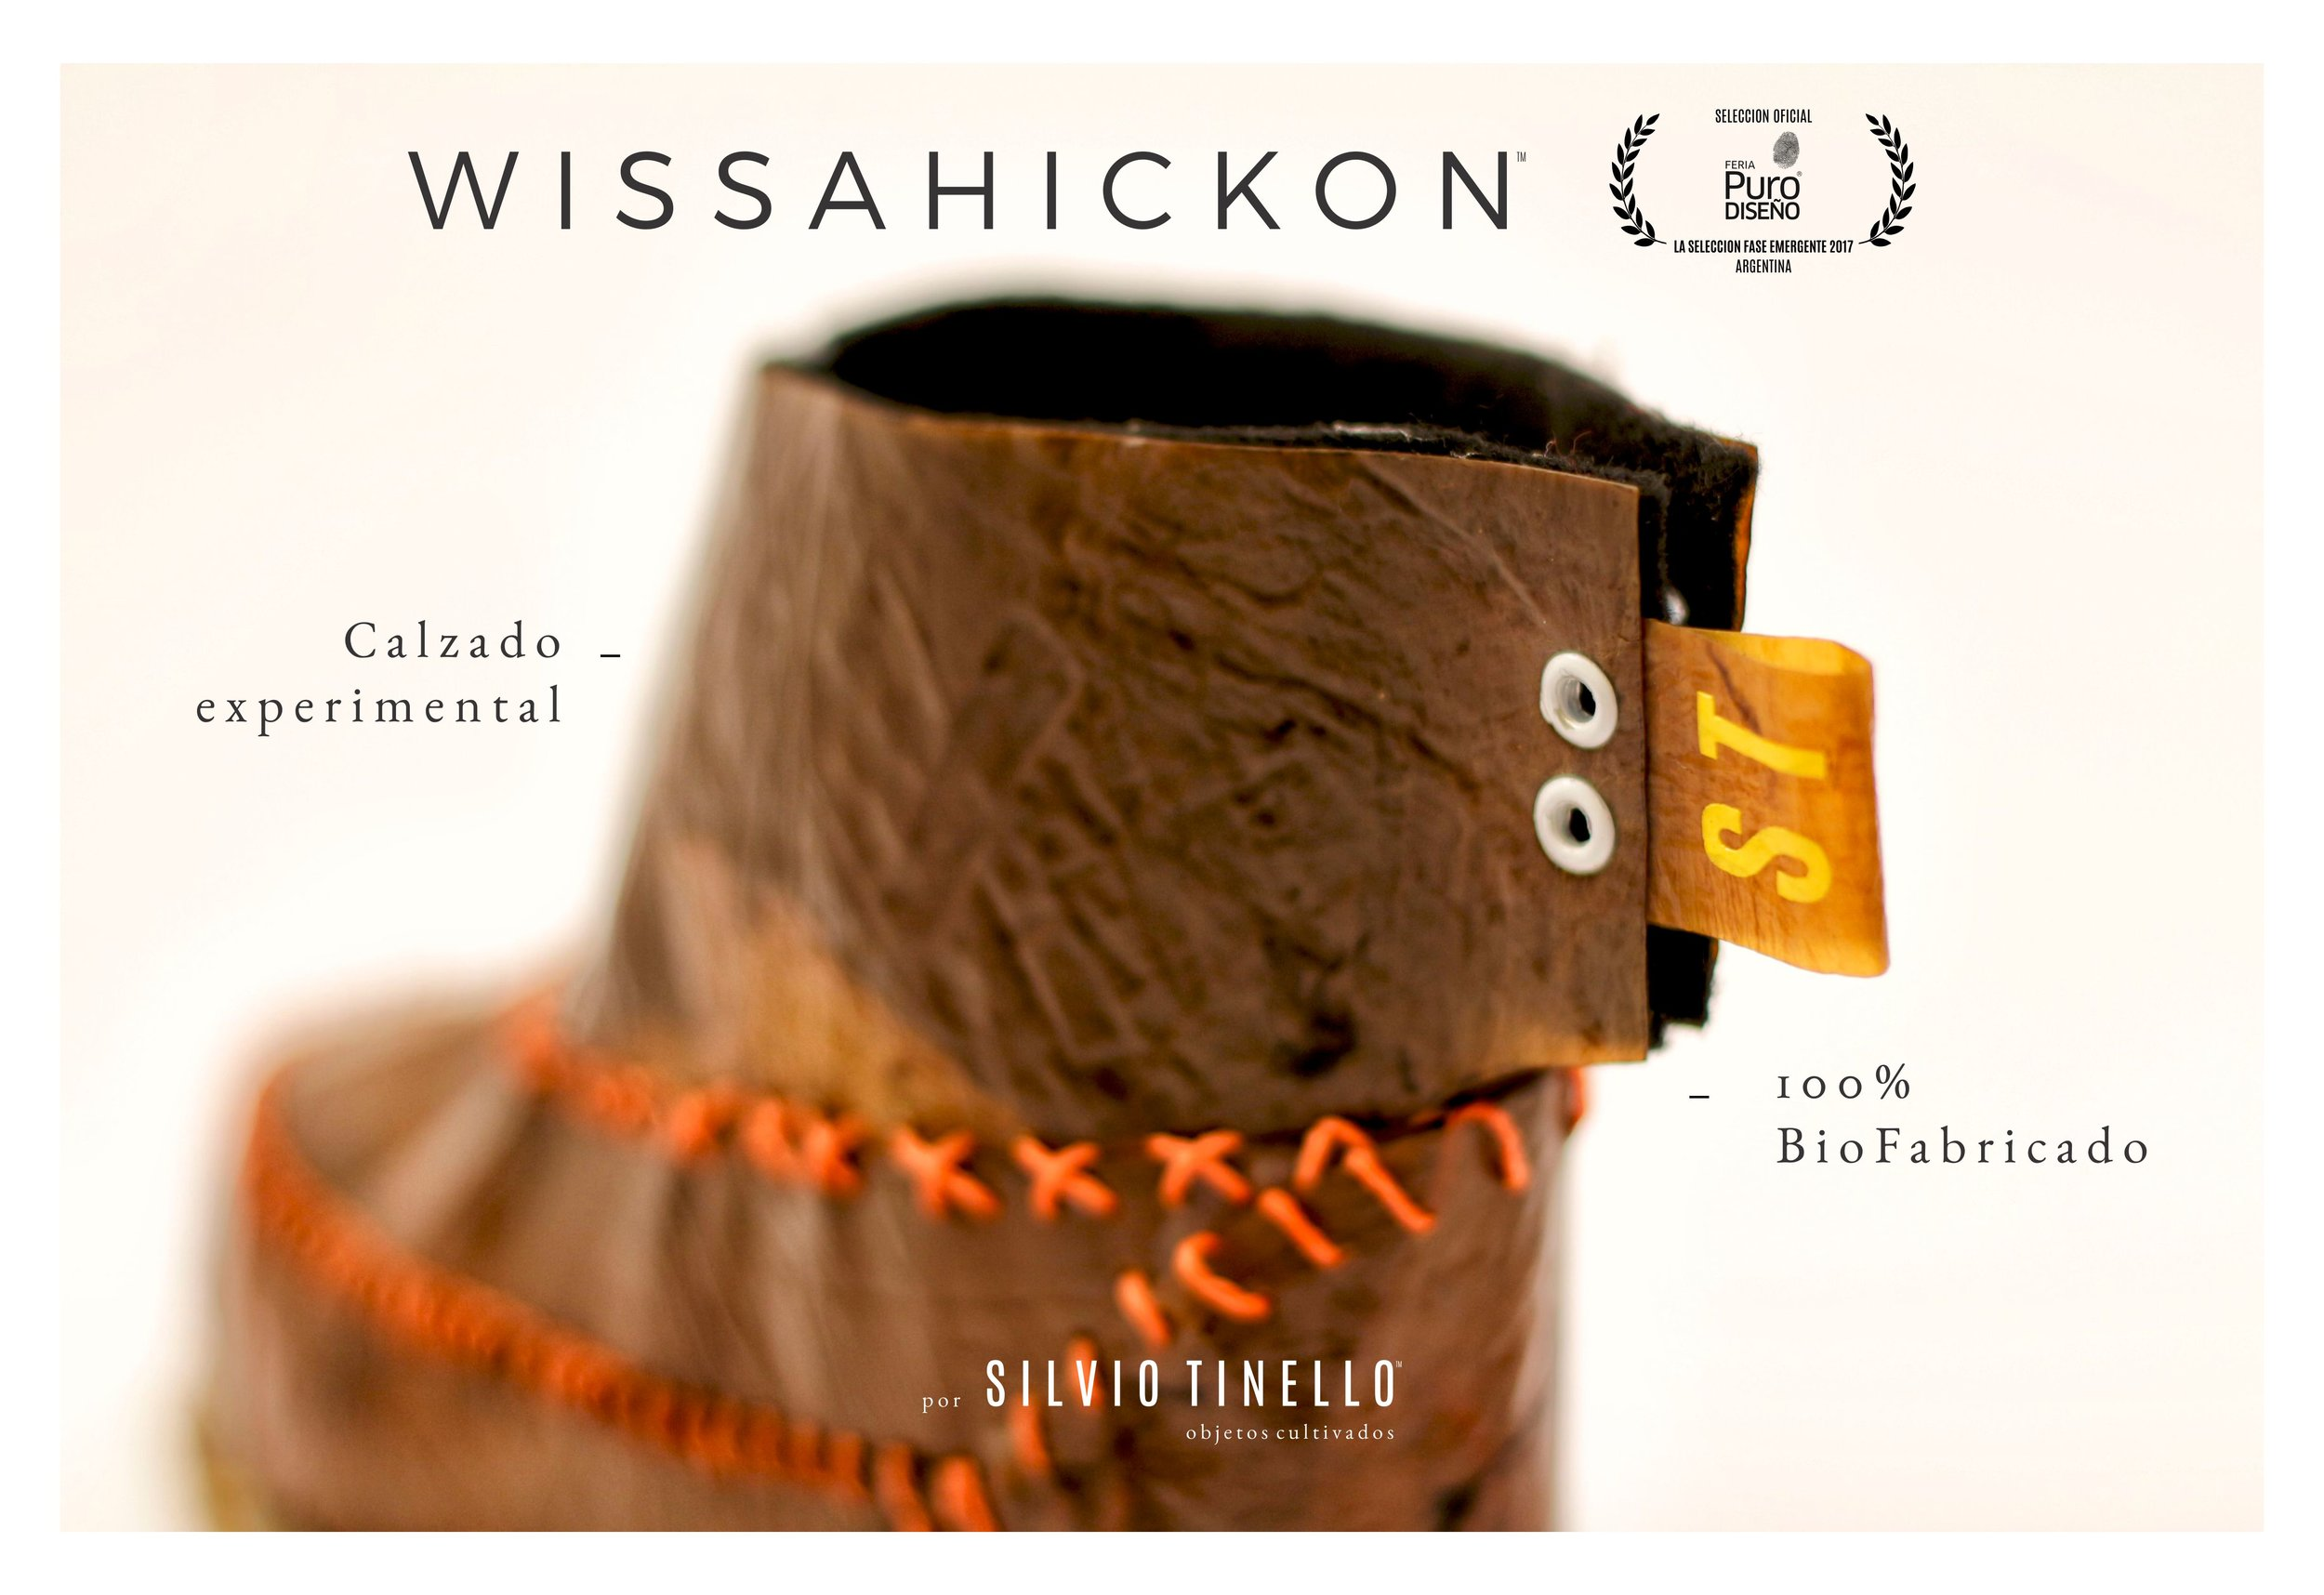 Wissahickon Calzado Experimental 100% Biofabricado II.jpg